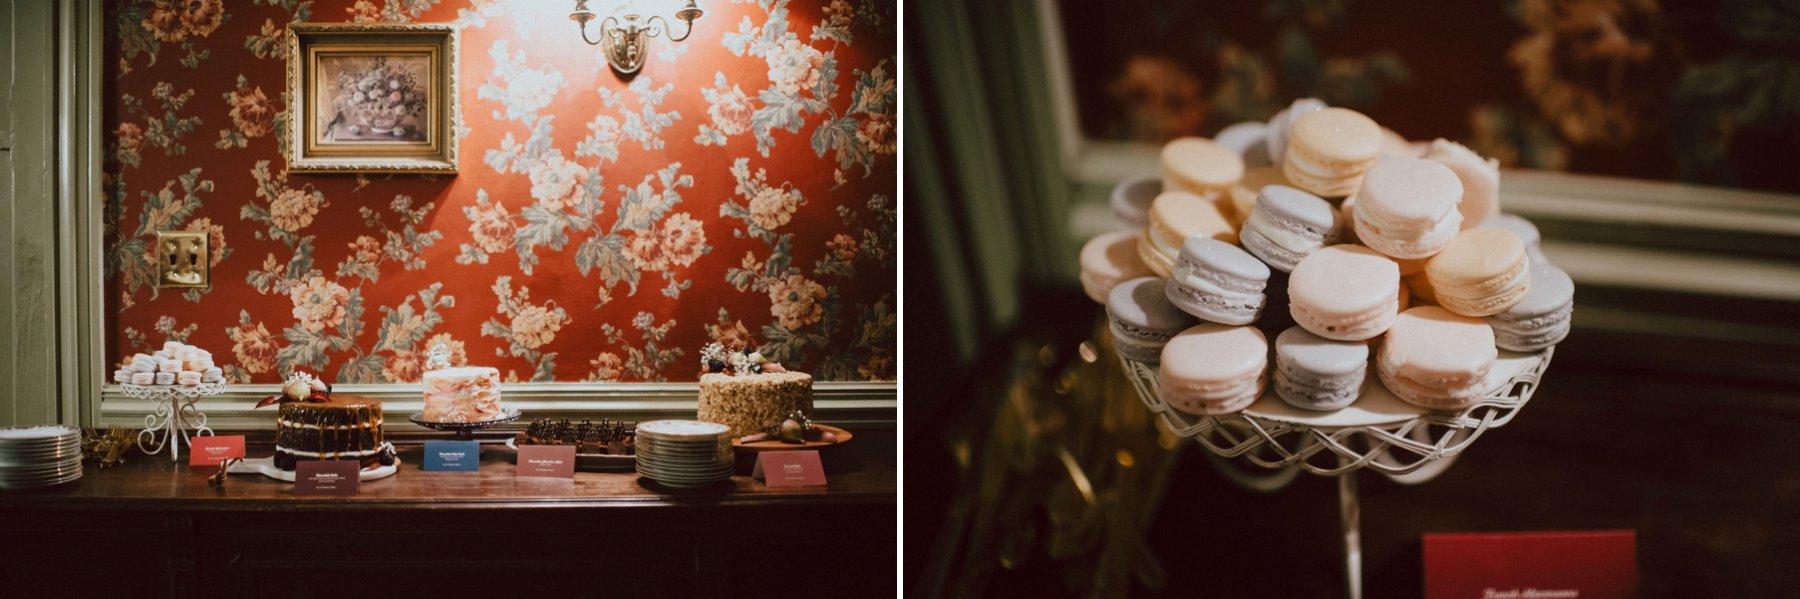 faunbrook-bed-and-breakfast-wedding-163.jpg